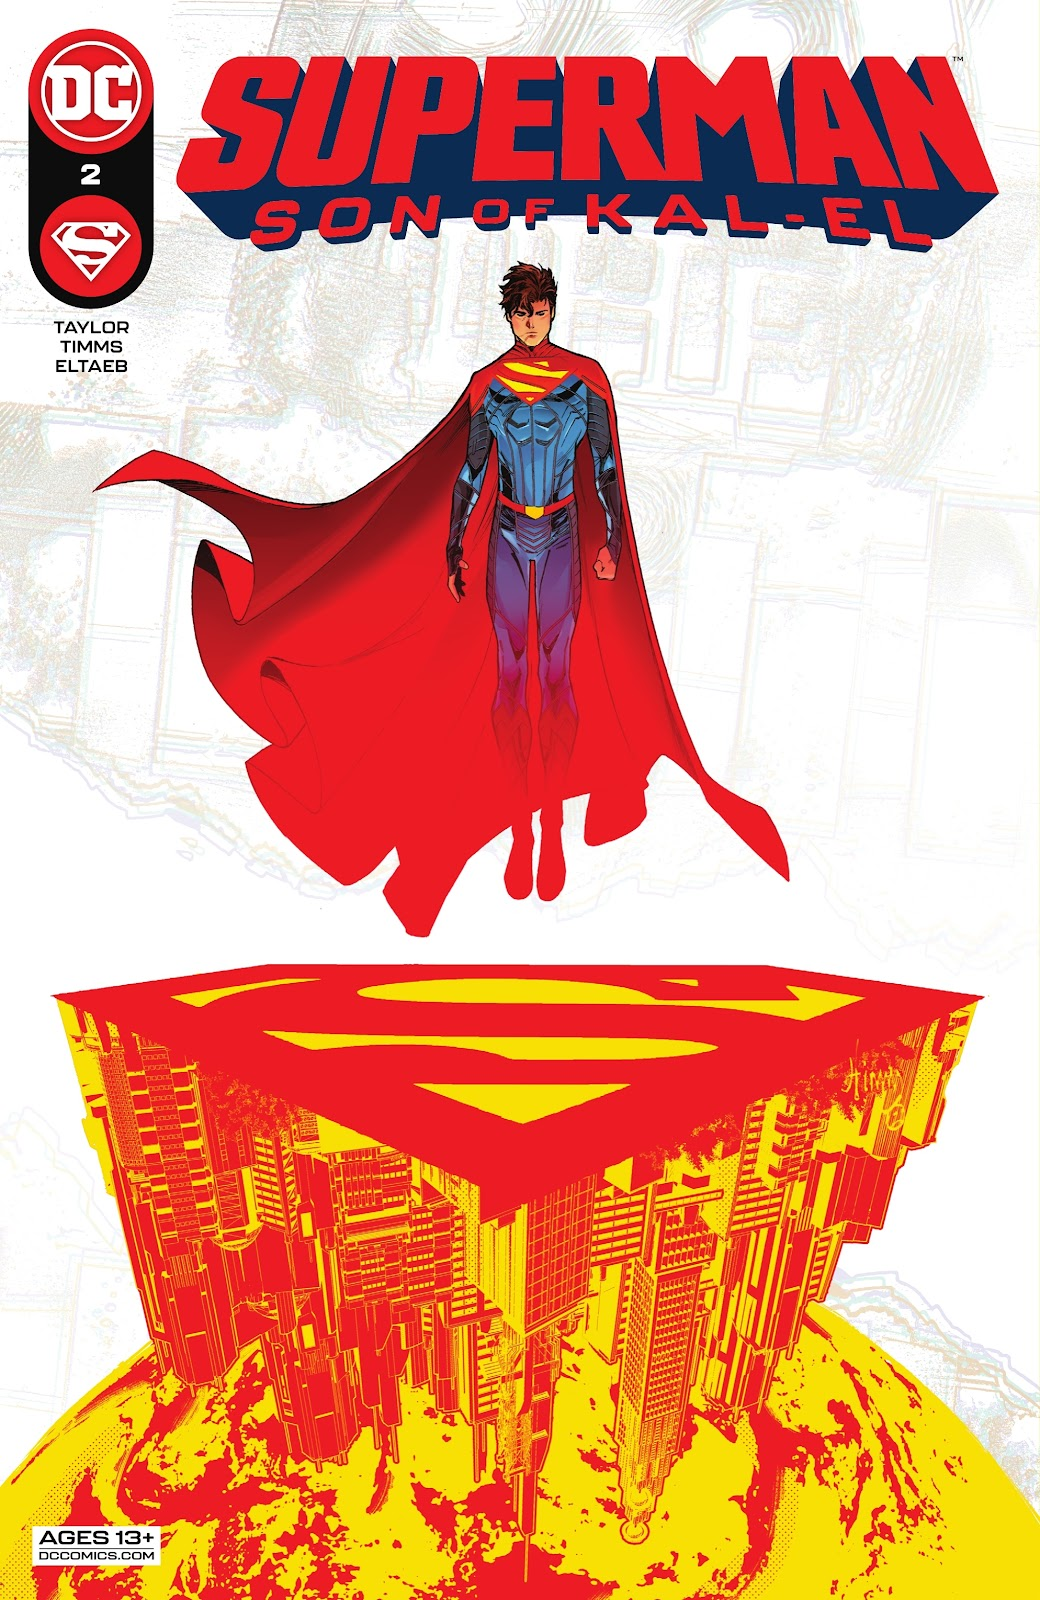 Superman Son of Kal-El 2, cover, John Timms